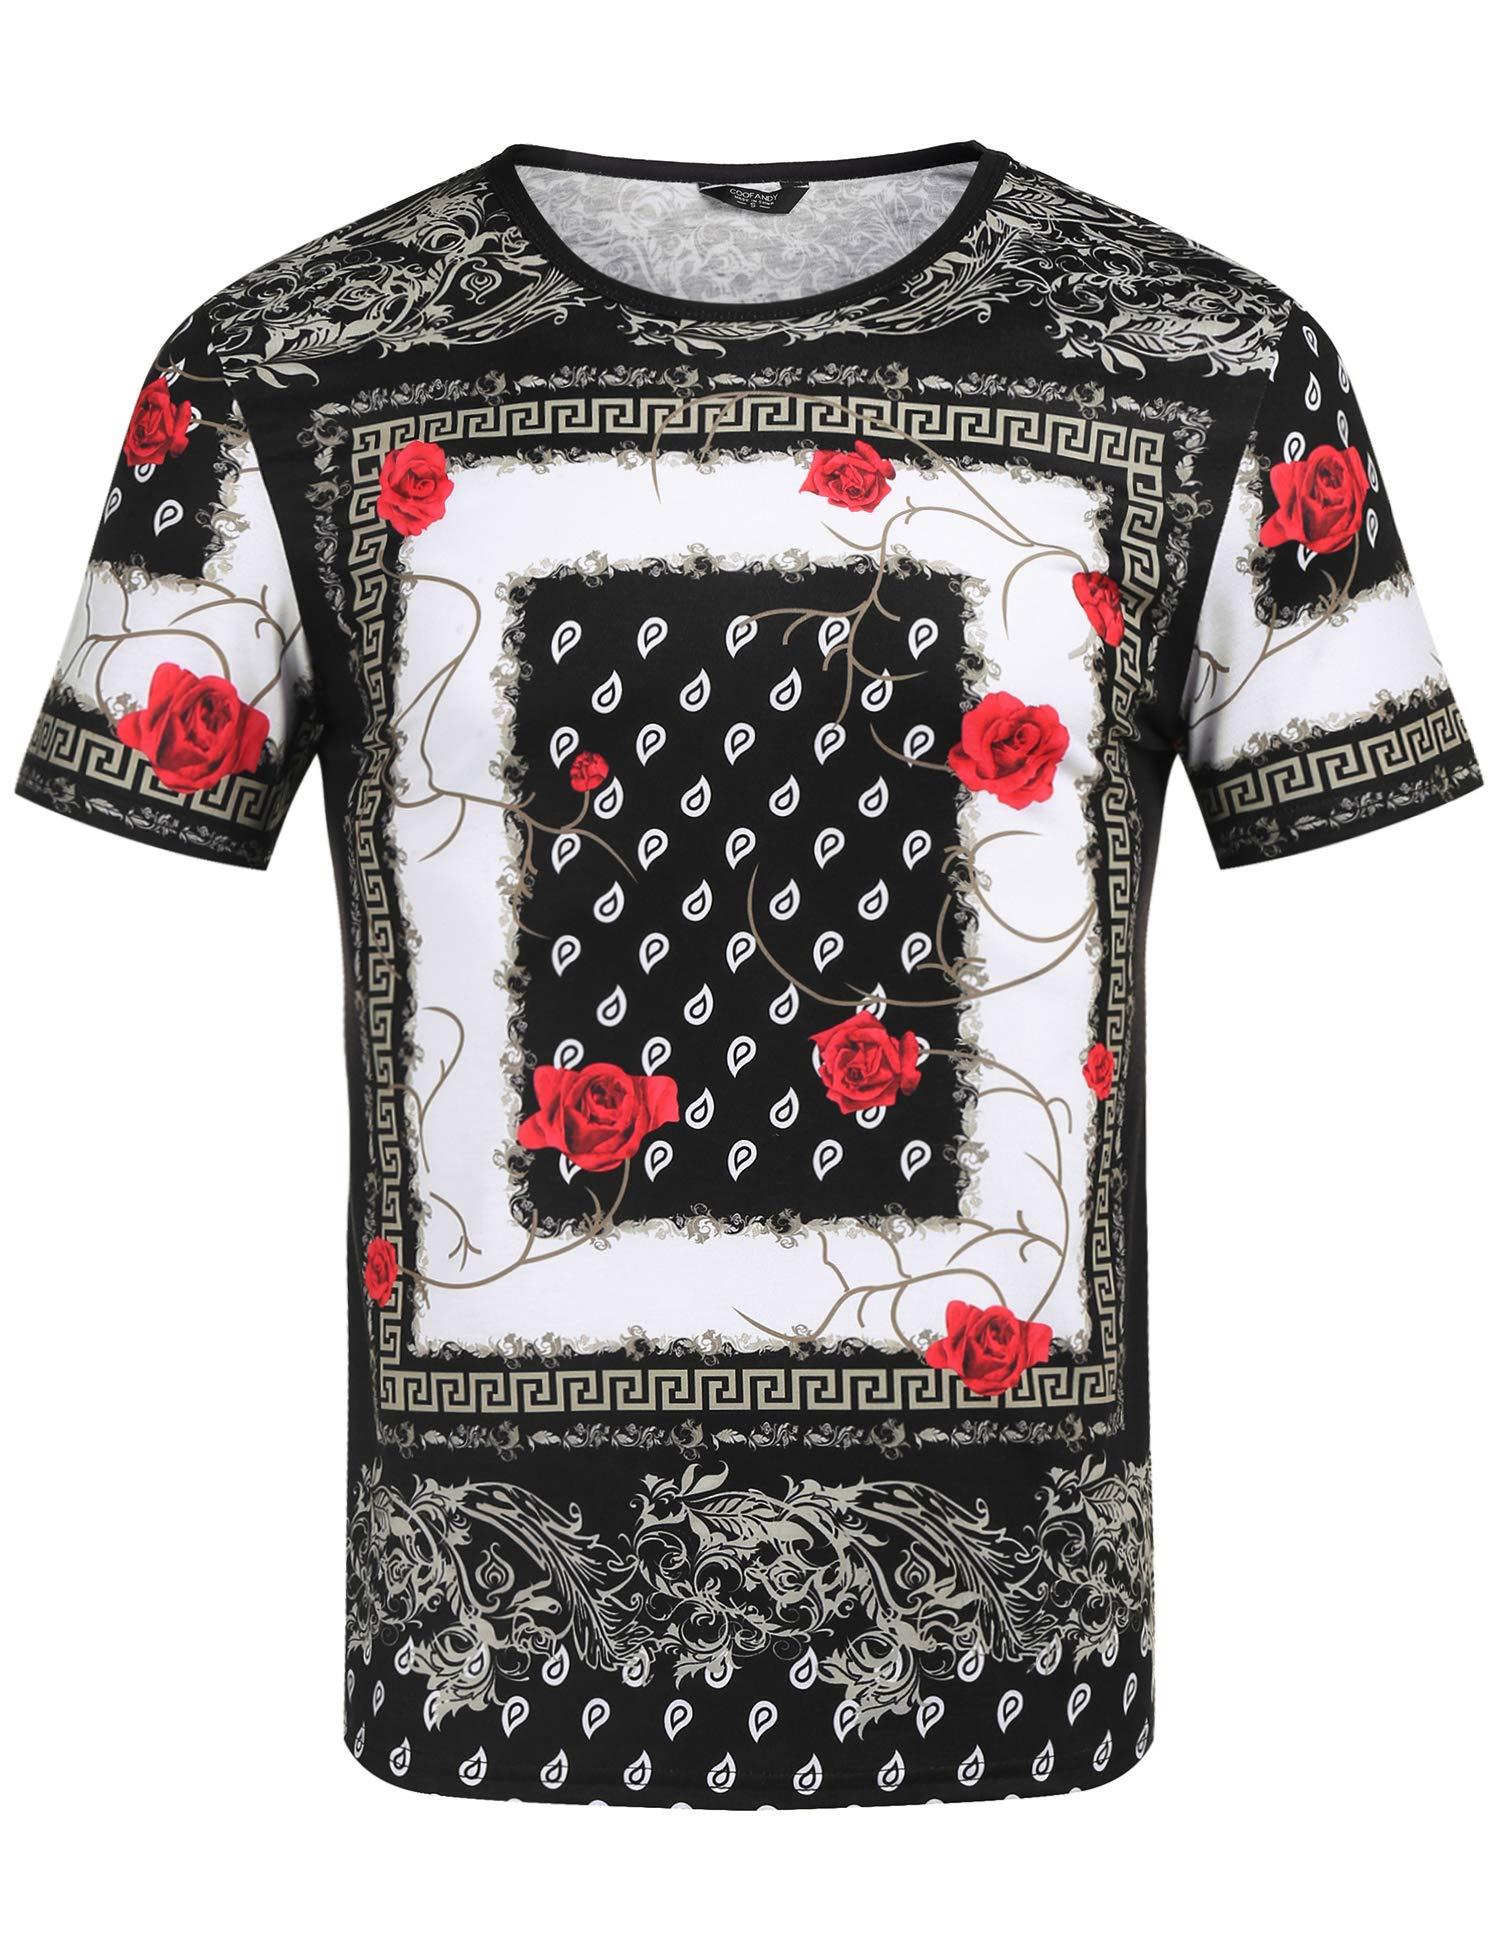 bd48b3be8 COOFANDY Men's Hipster Hip Hop T Shirt Luxury Graphic Printed Shirts  Fashion African Print Tee